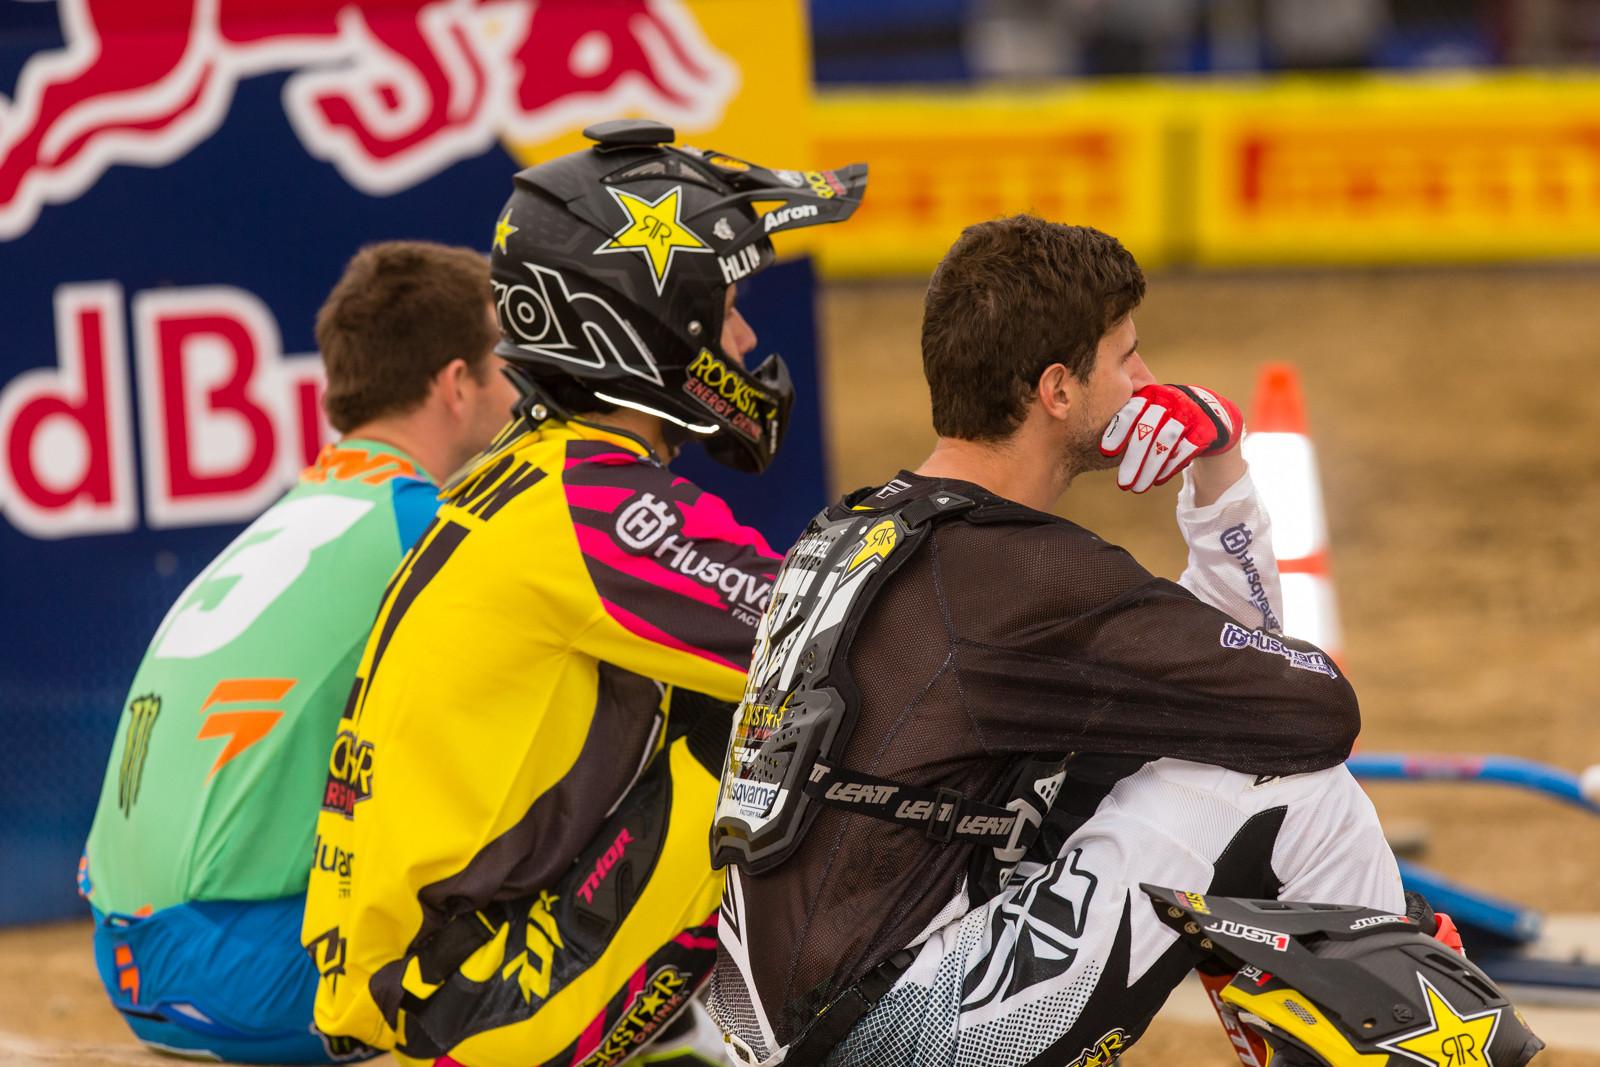 Josh Grant, Jason Anderson, Christophe Pourcel - Vital MX Pit Bits: Glen Helen - Motocross Pictures - Vital MX